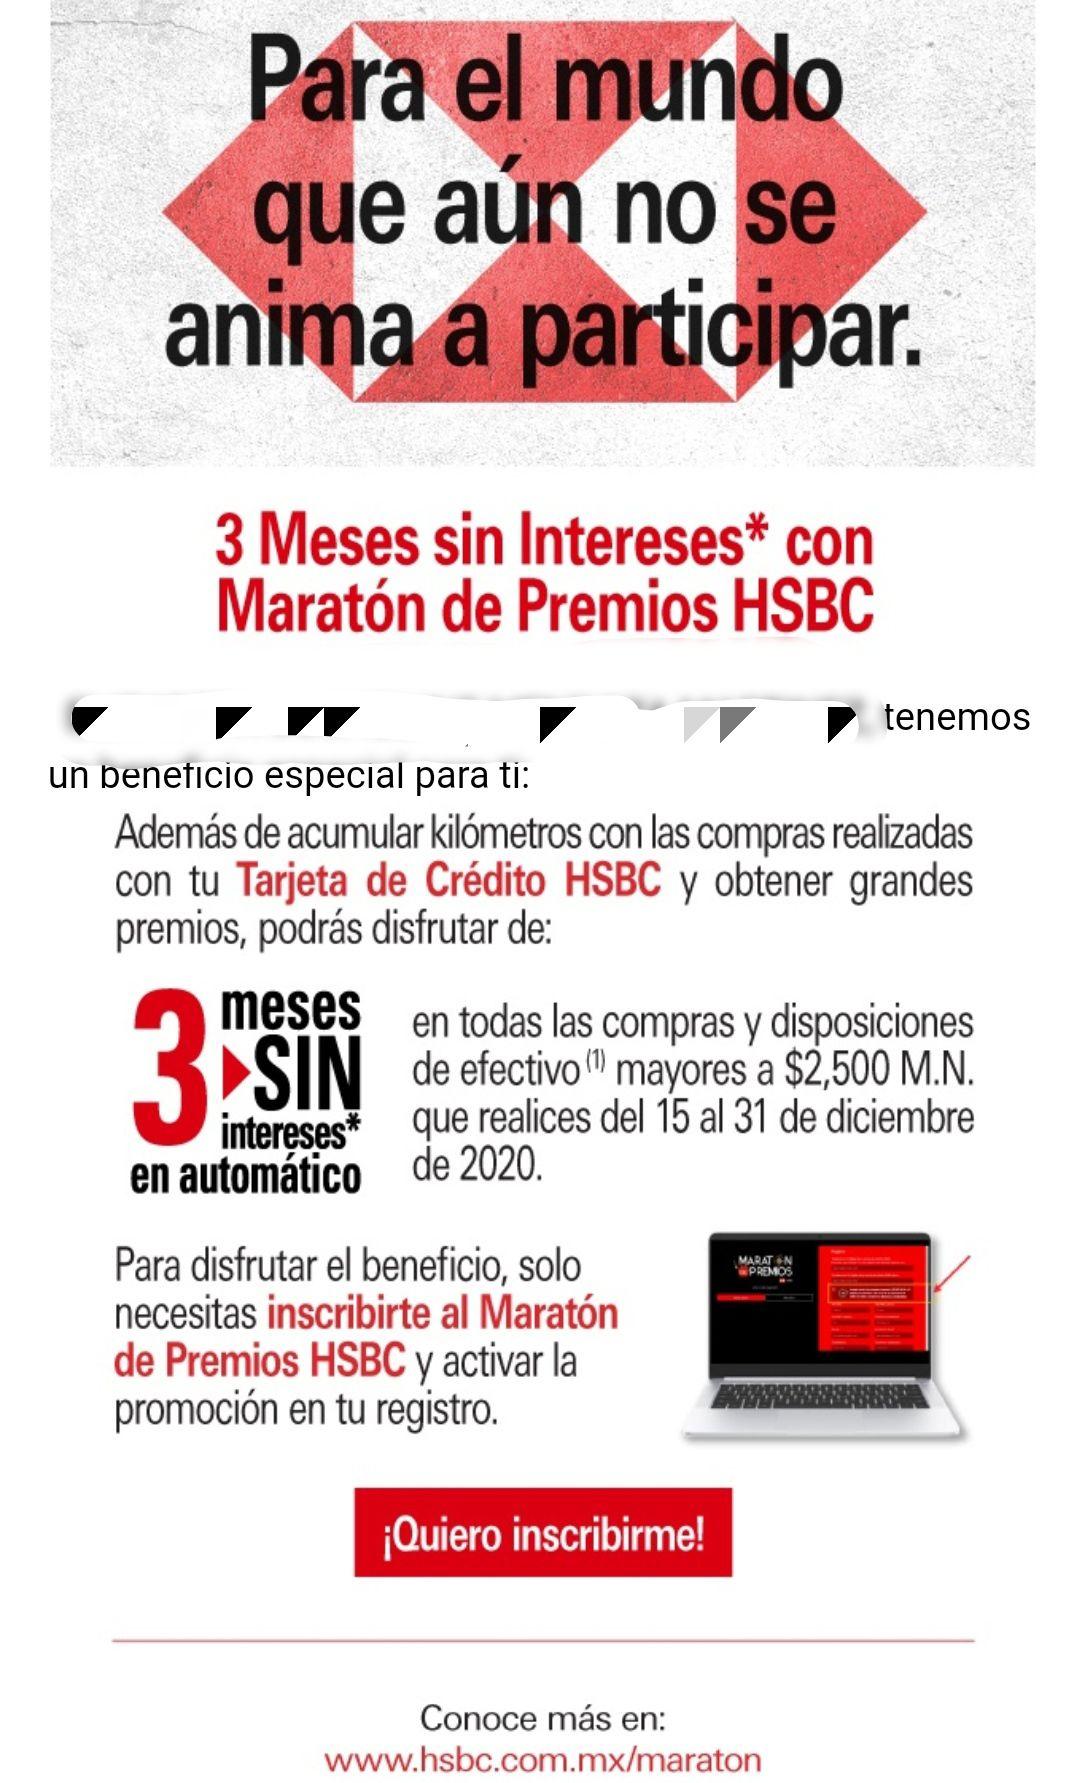 HSBC 3MSI en Maratón de Premios 2020 (Beneficio Adicional)